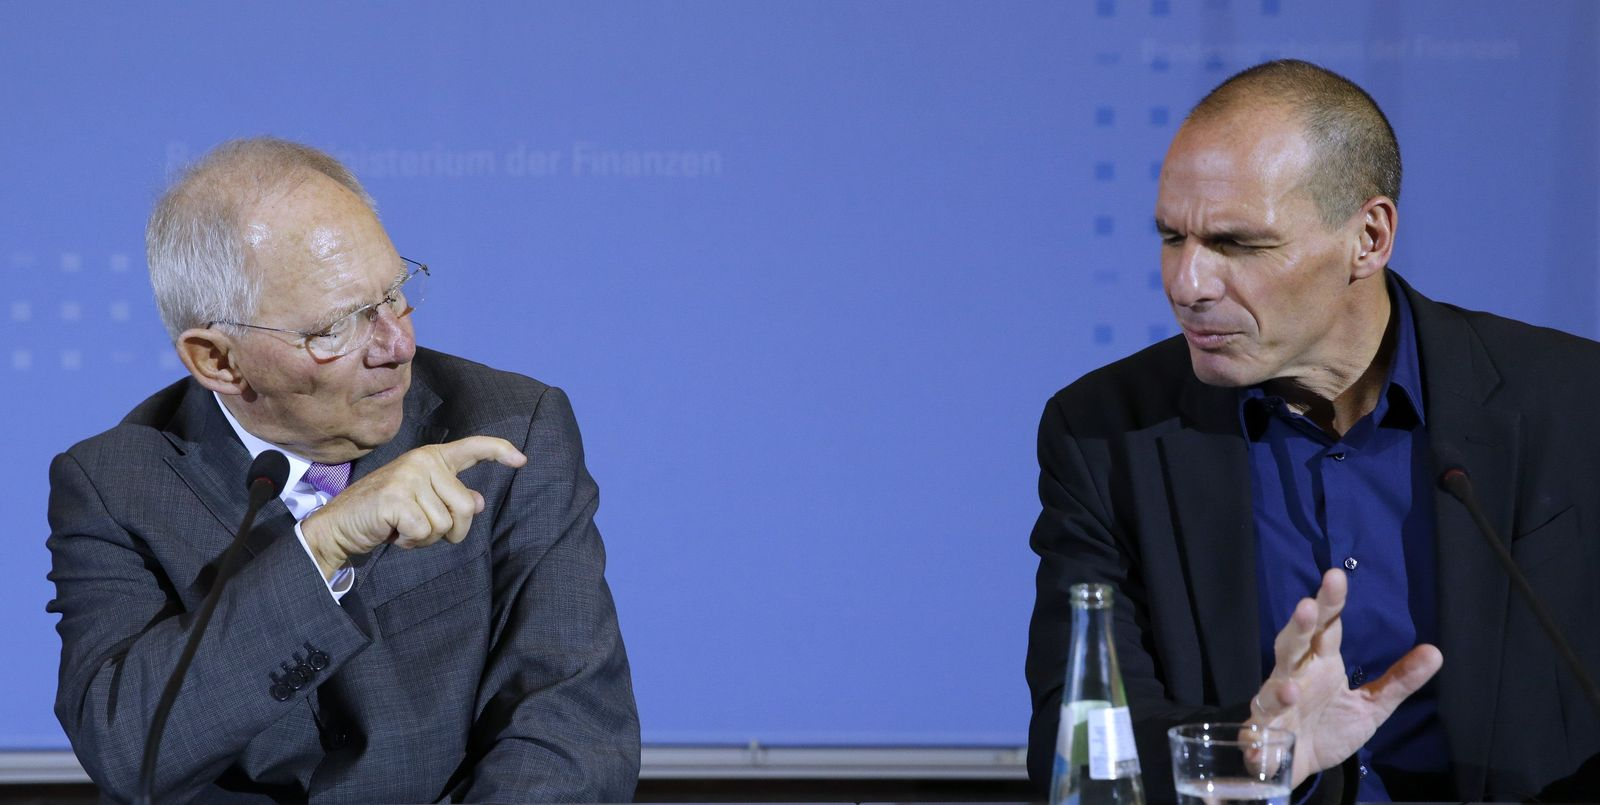 Wolfgang Schäuble / Yanis Varoufakis